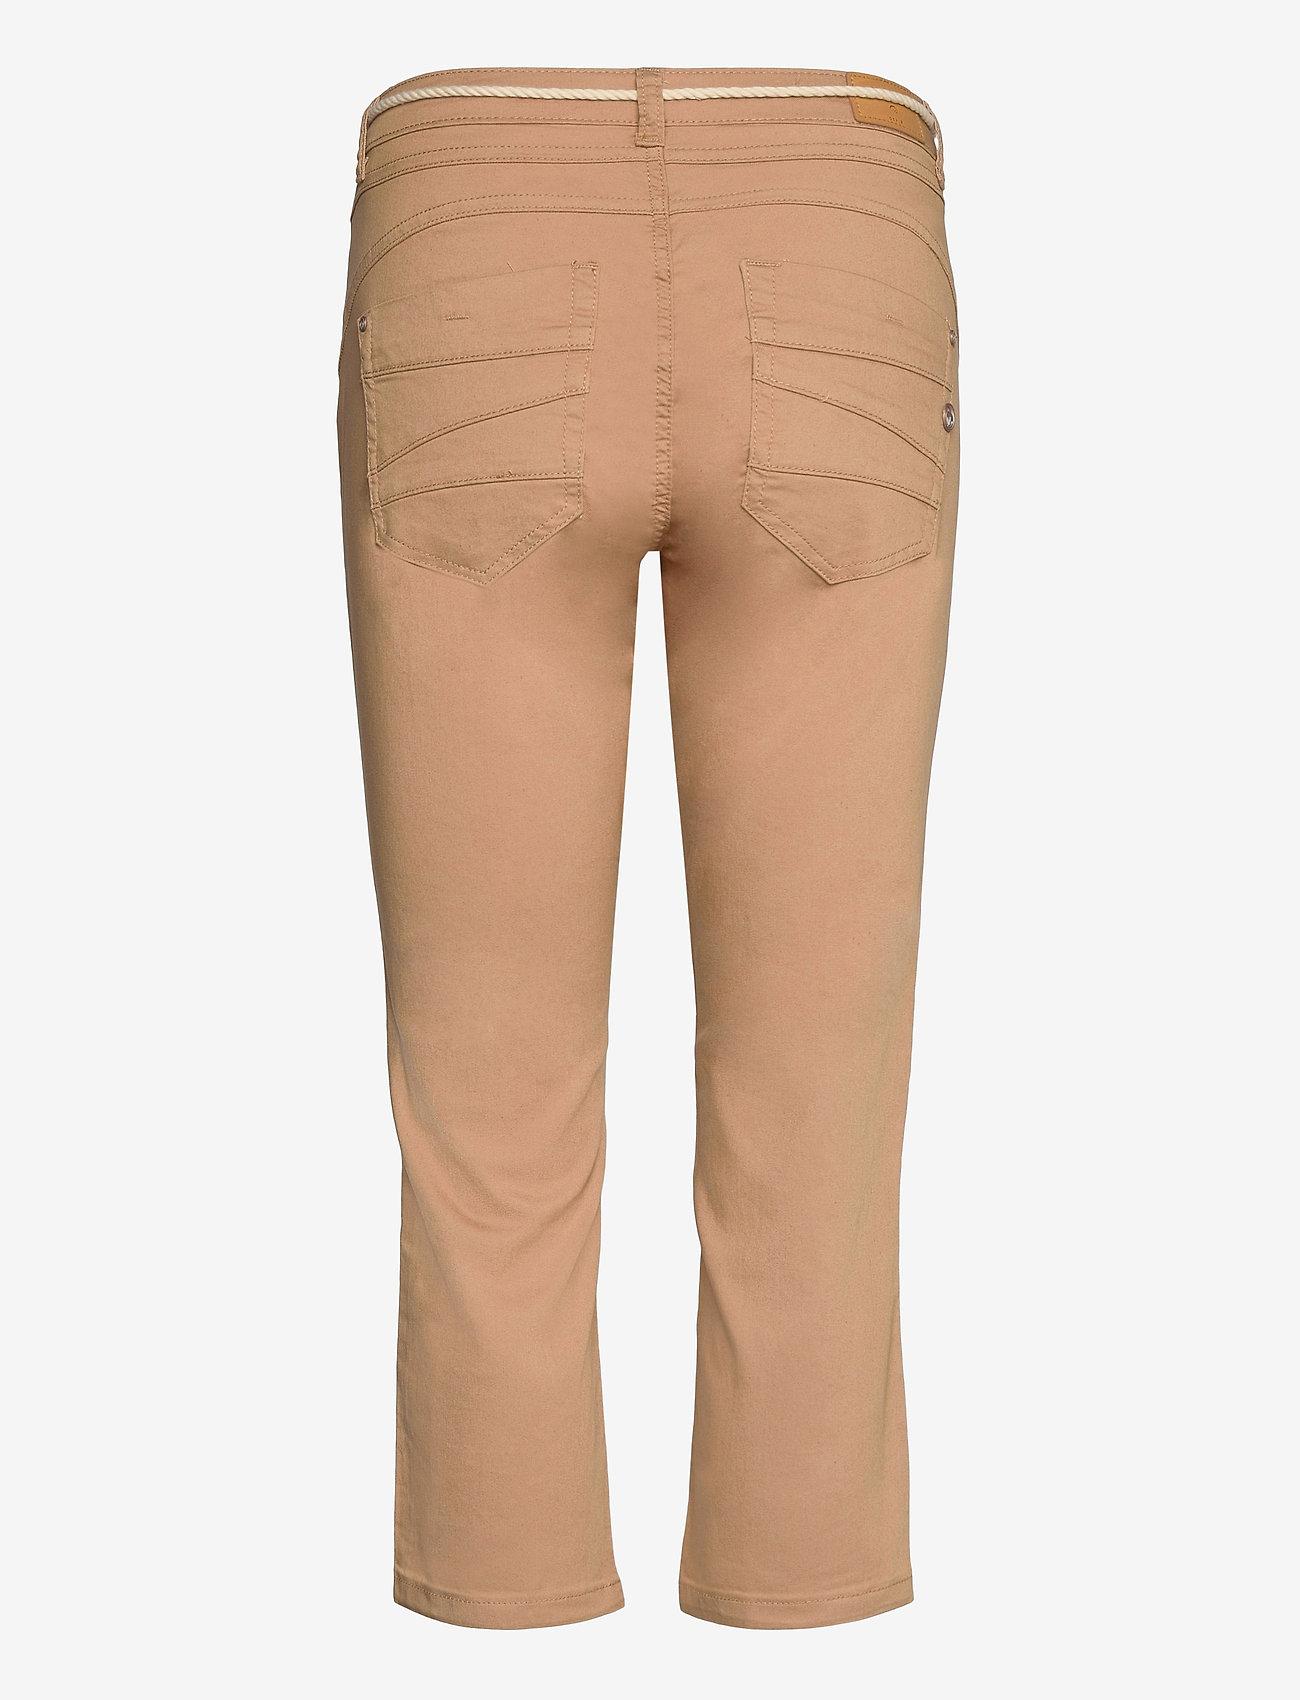 Cream - CRVava Pant 3/4 - Coco Fit - straight regular - tannin - 1